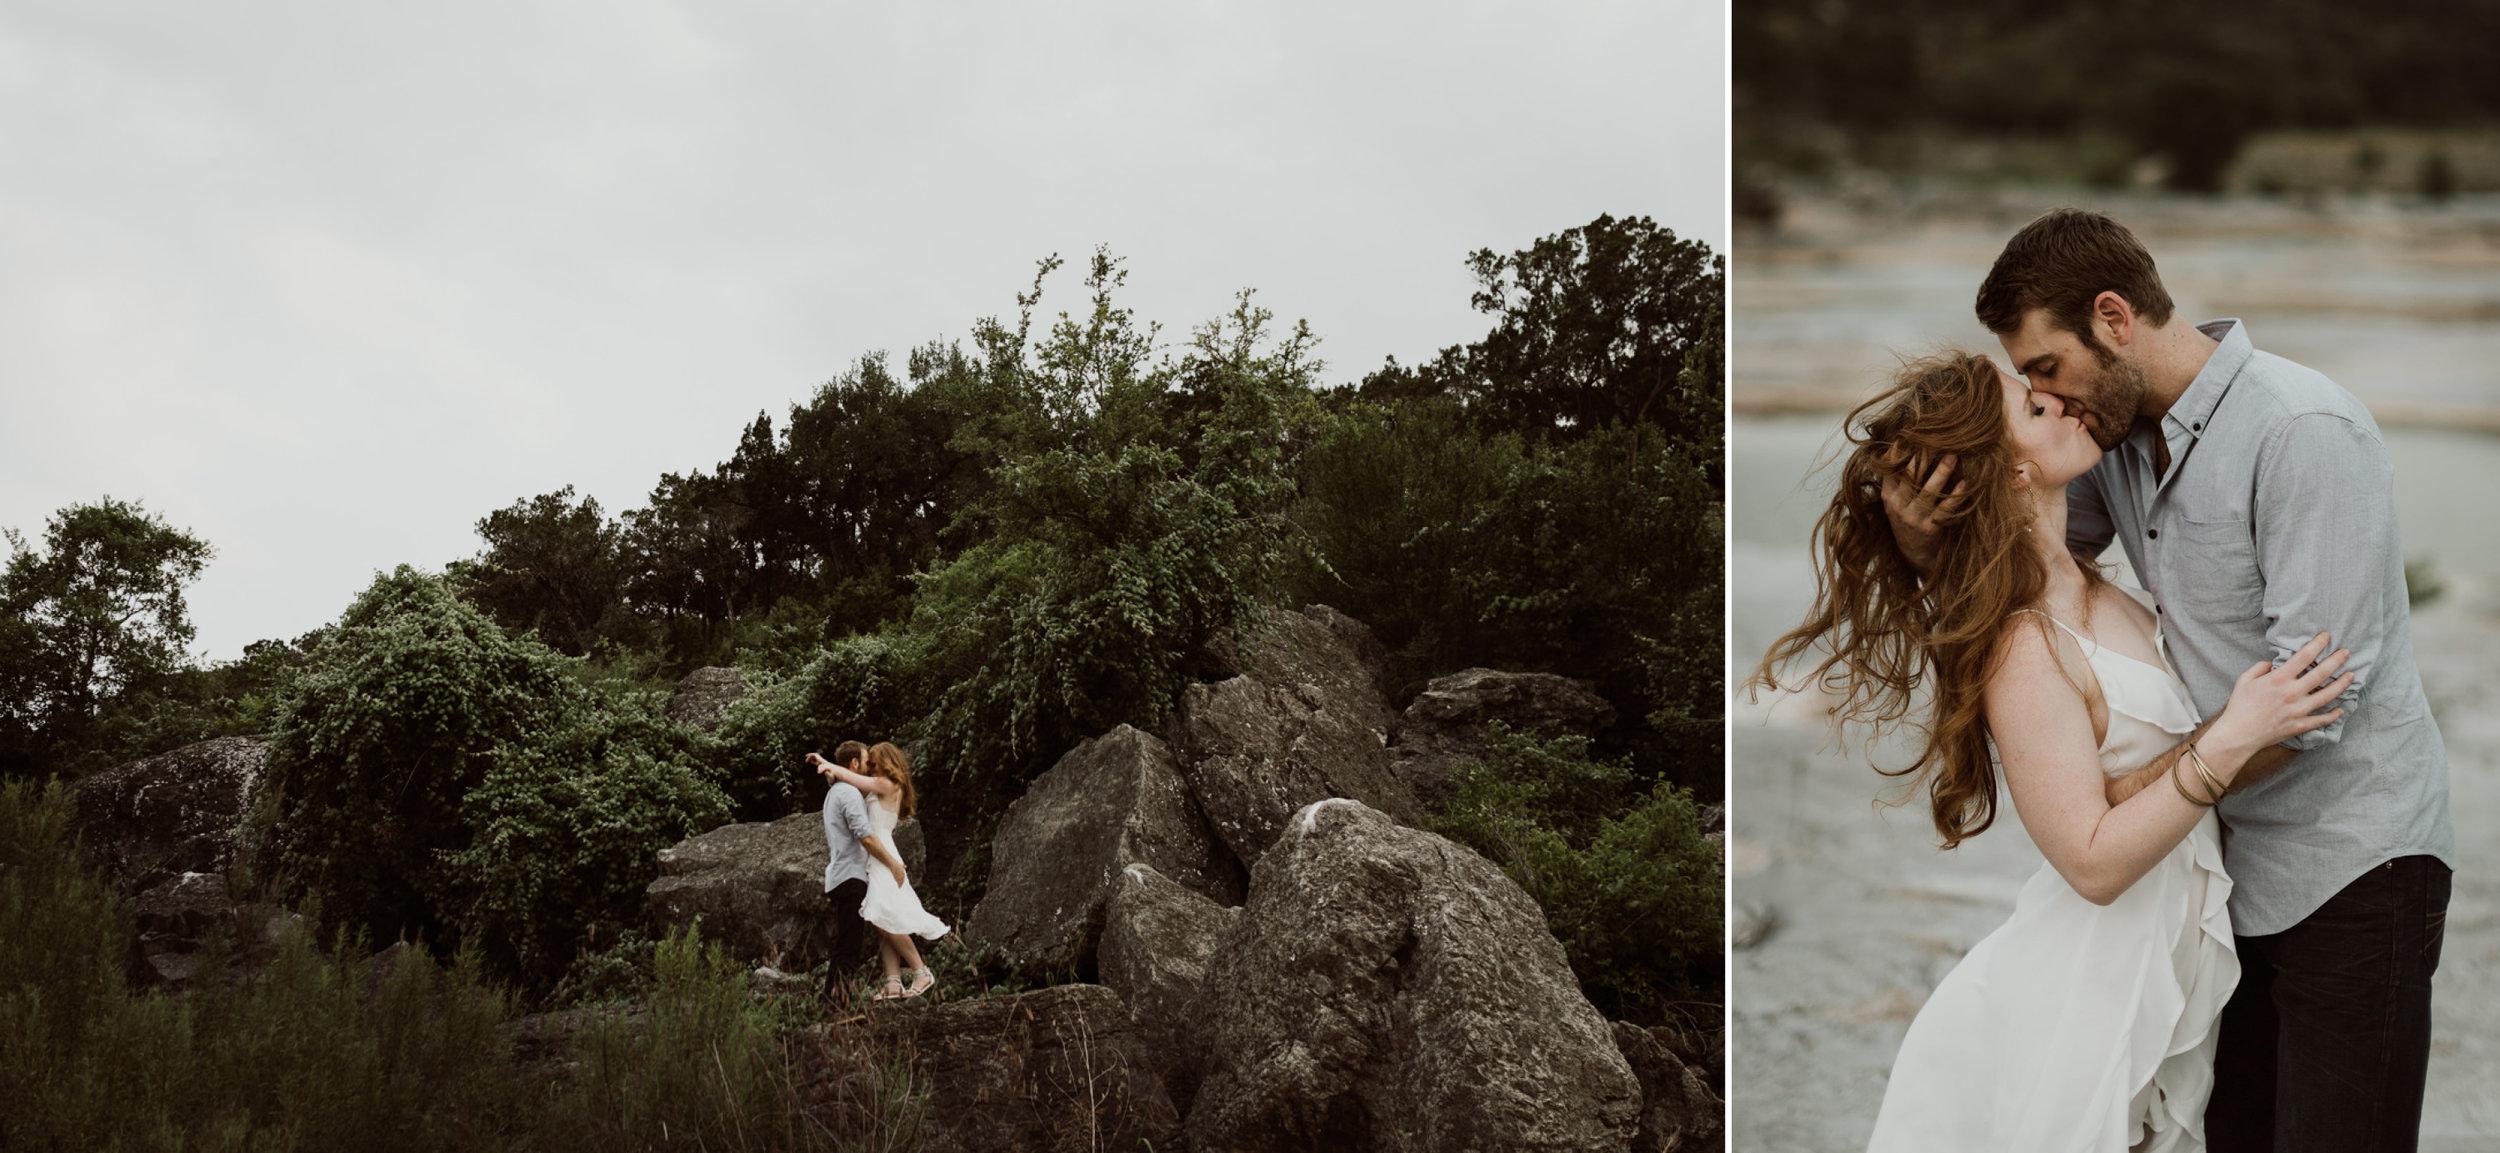 17-5-adventure-wedding-photographer-20.jpg